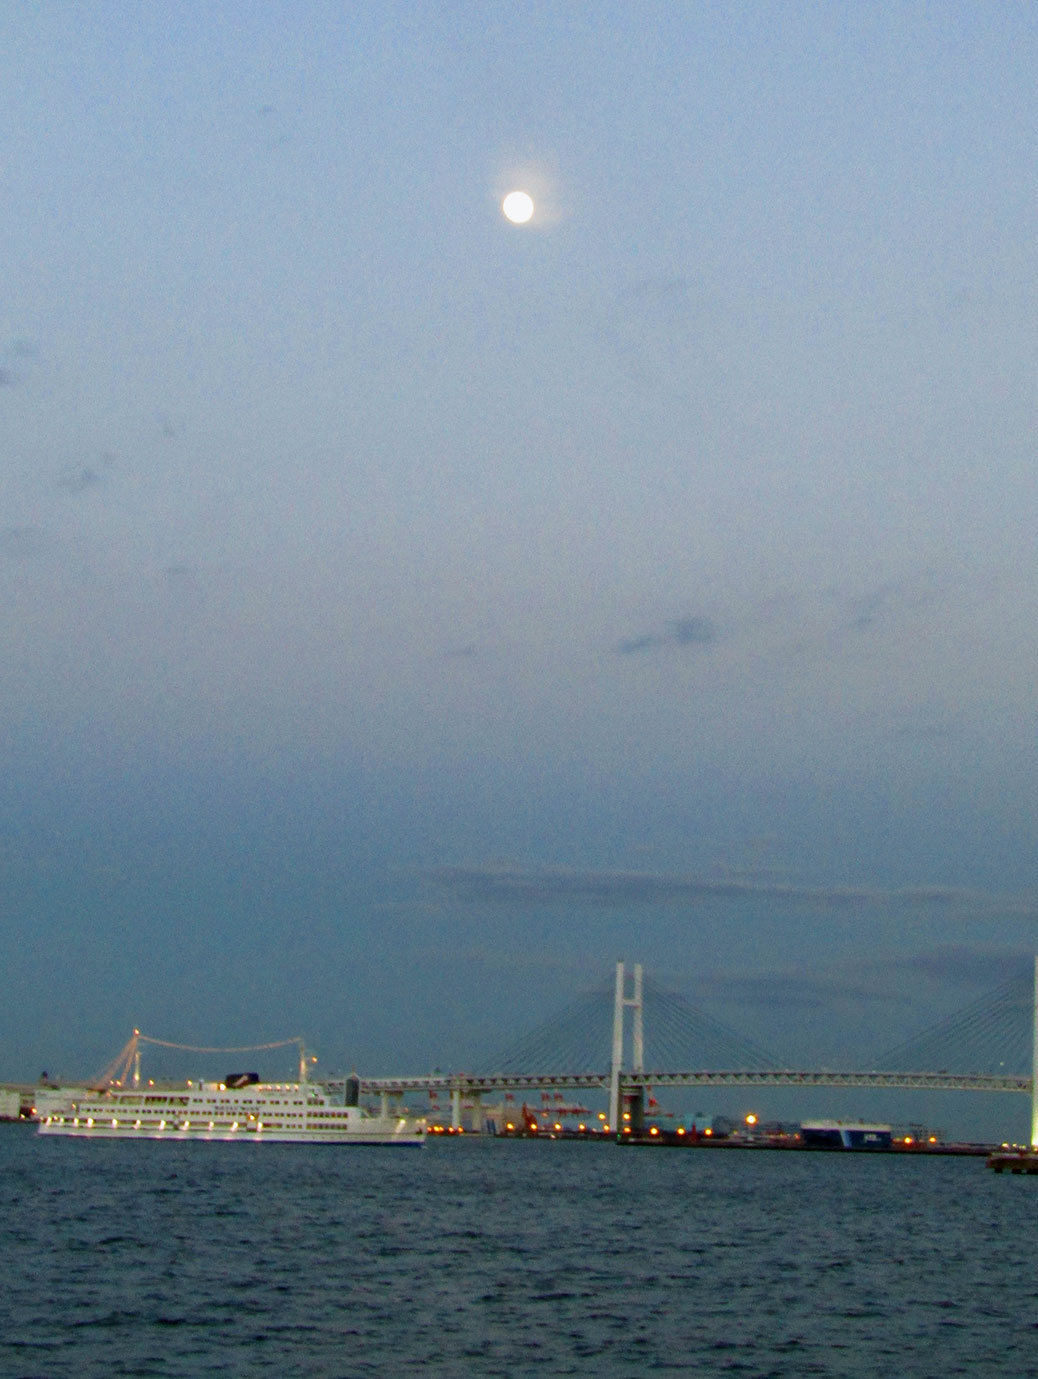 The Yokohama Bay Bridge spans Tokyo Bay